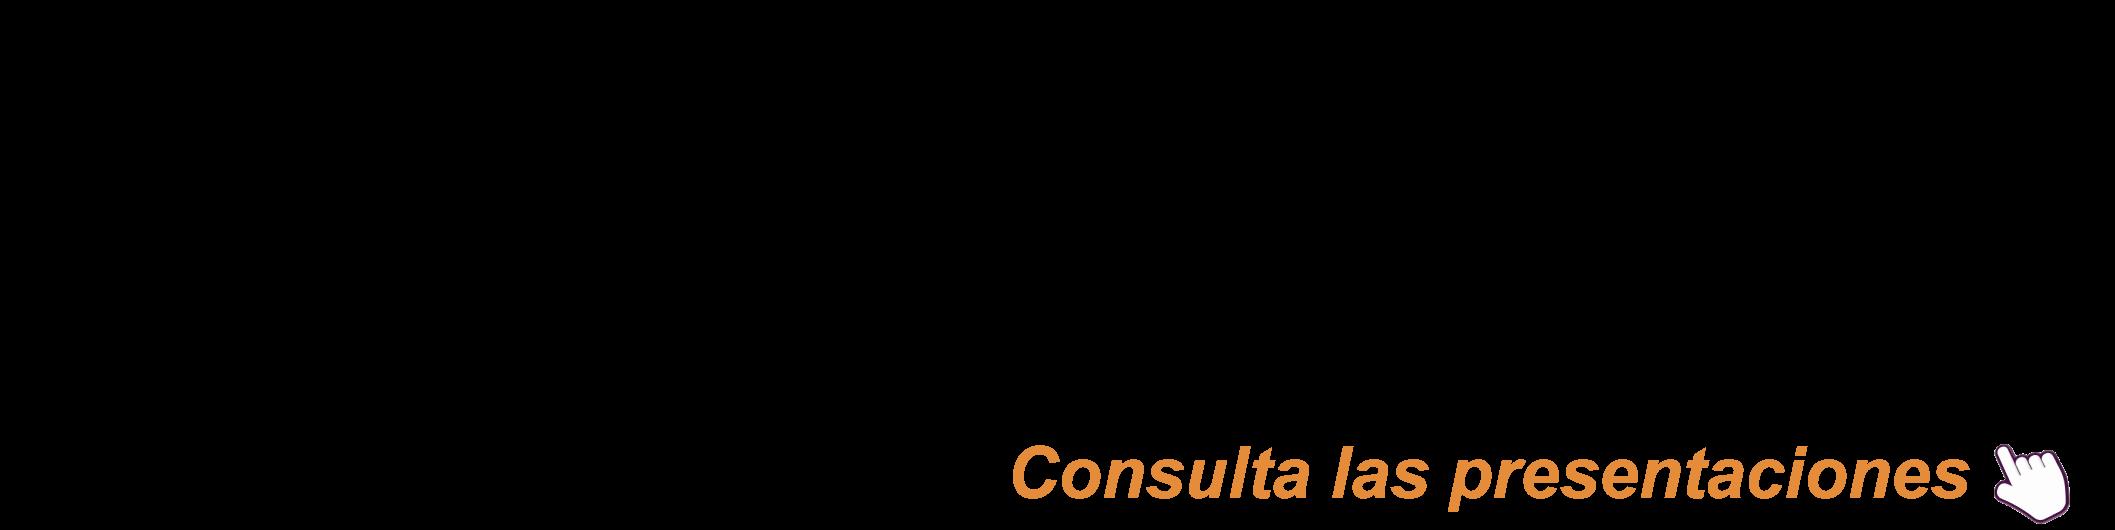 consulta_presentaciones.png